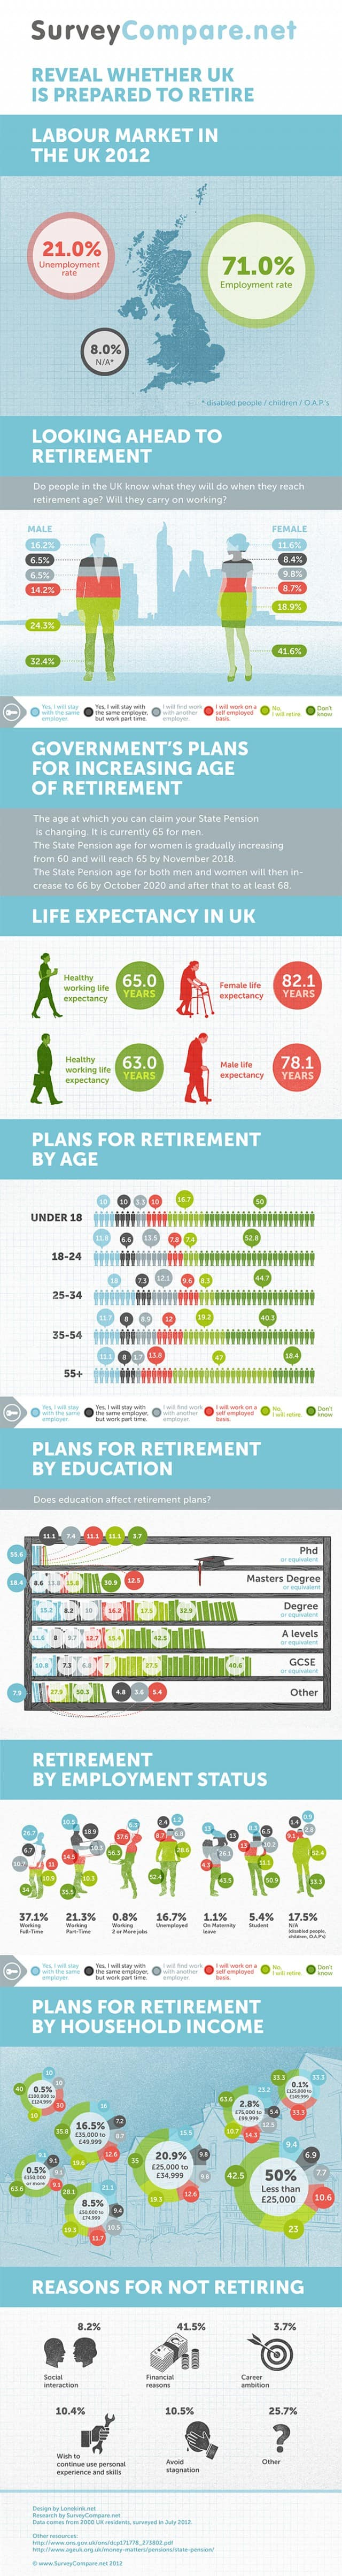 U.K.-Retirement-640x4815